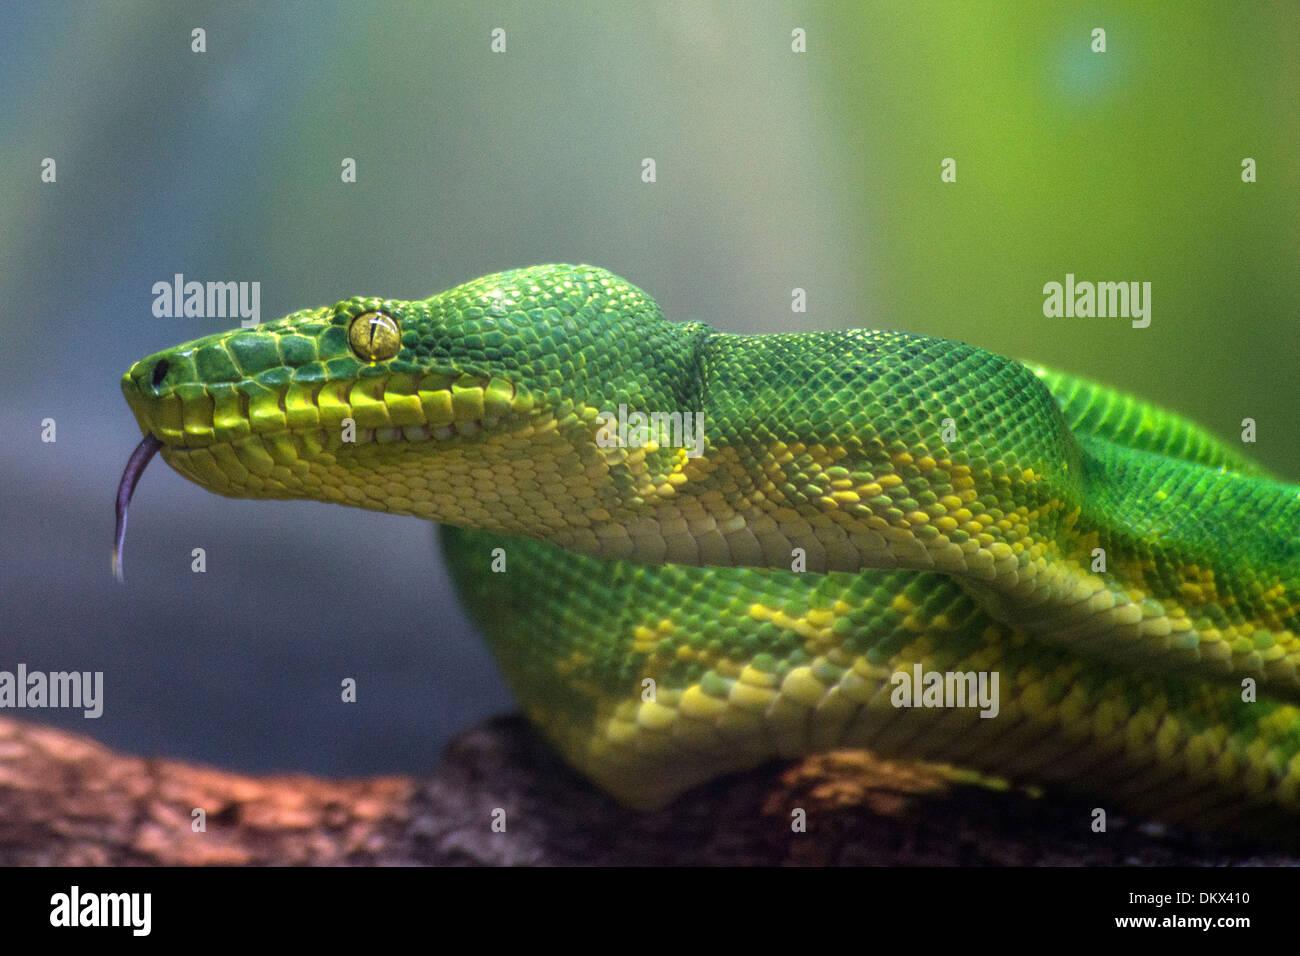 Green Boa Stock Photos & Green Boa Stock Images - Alamy